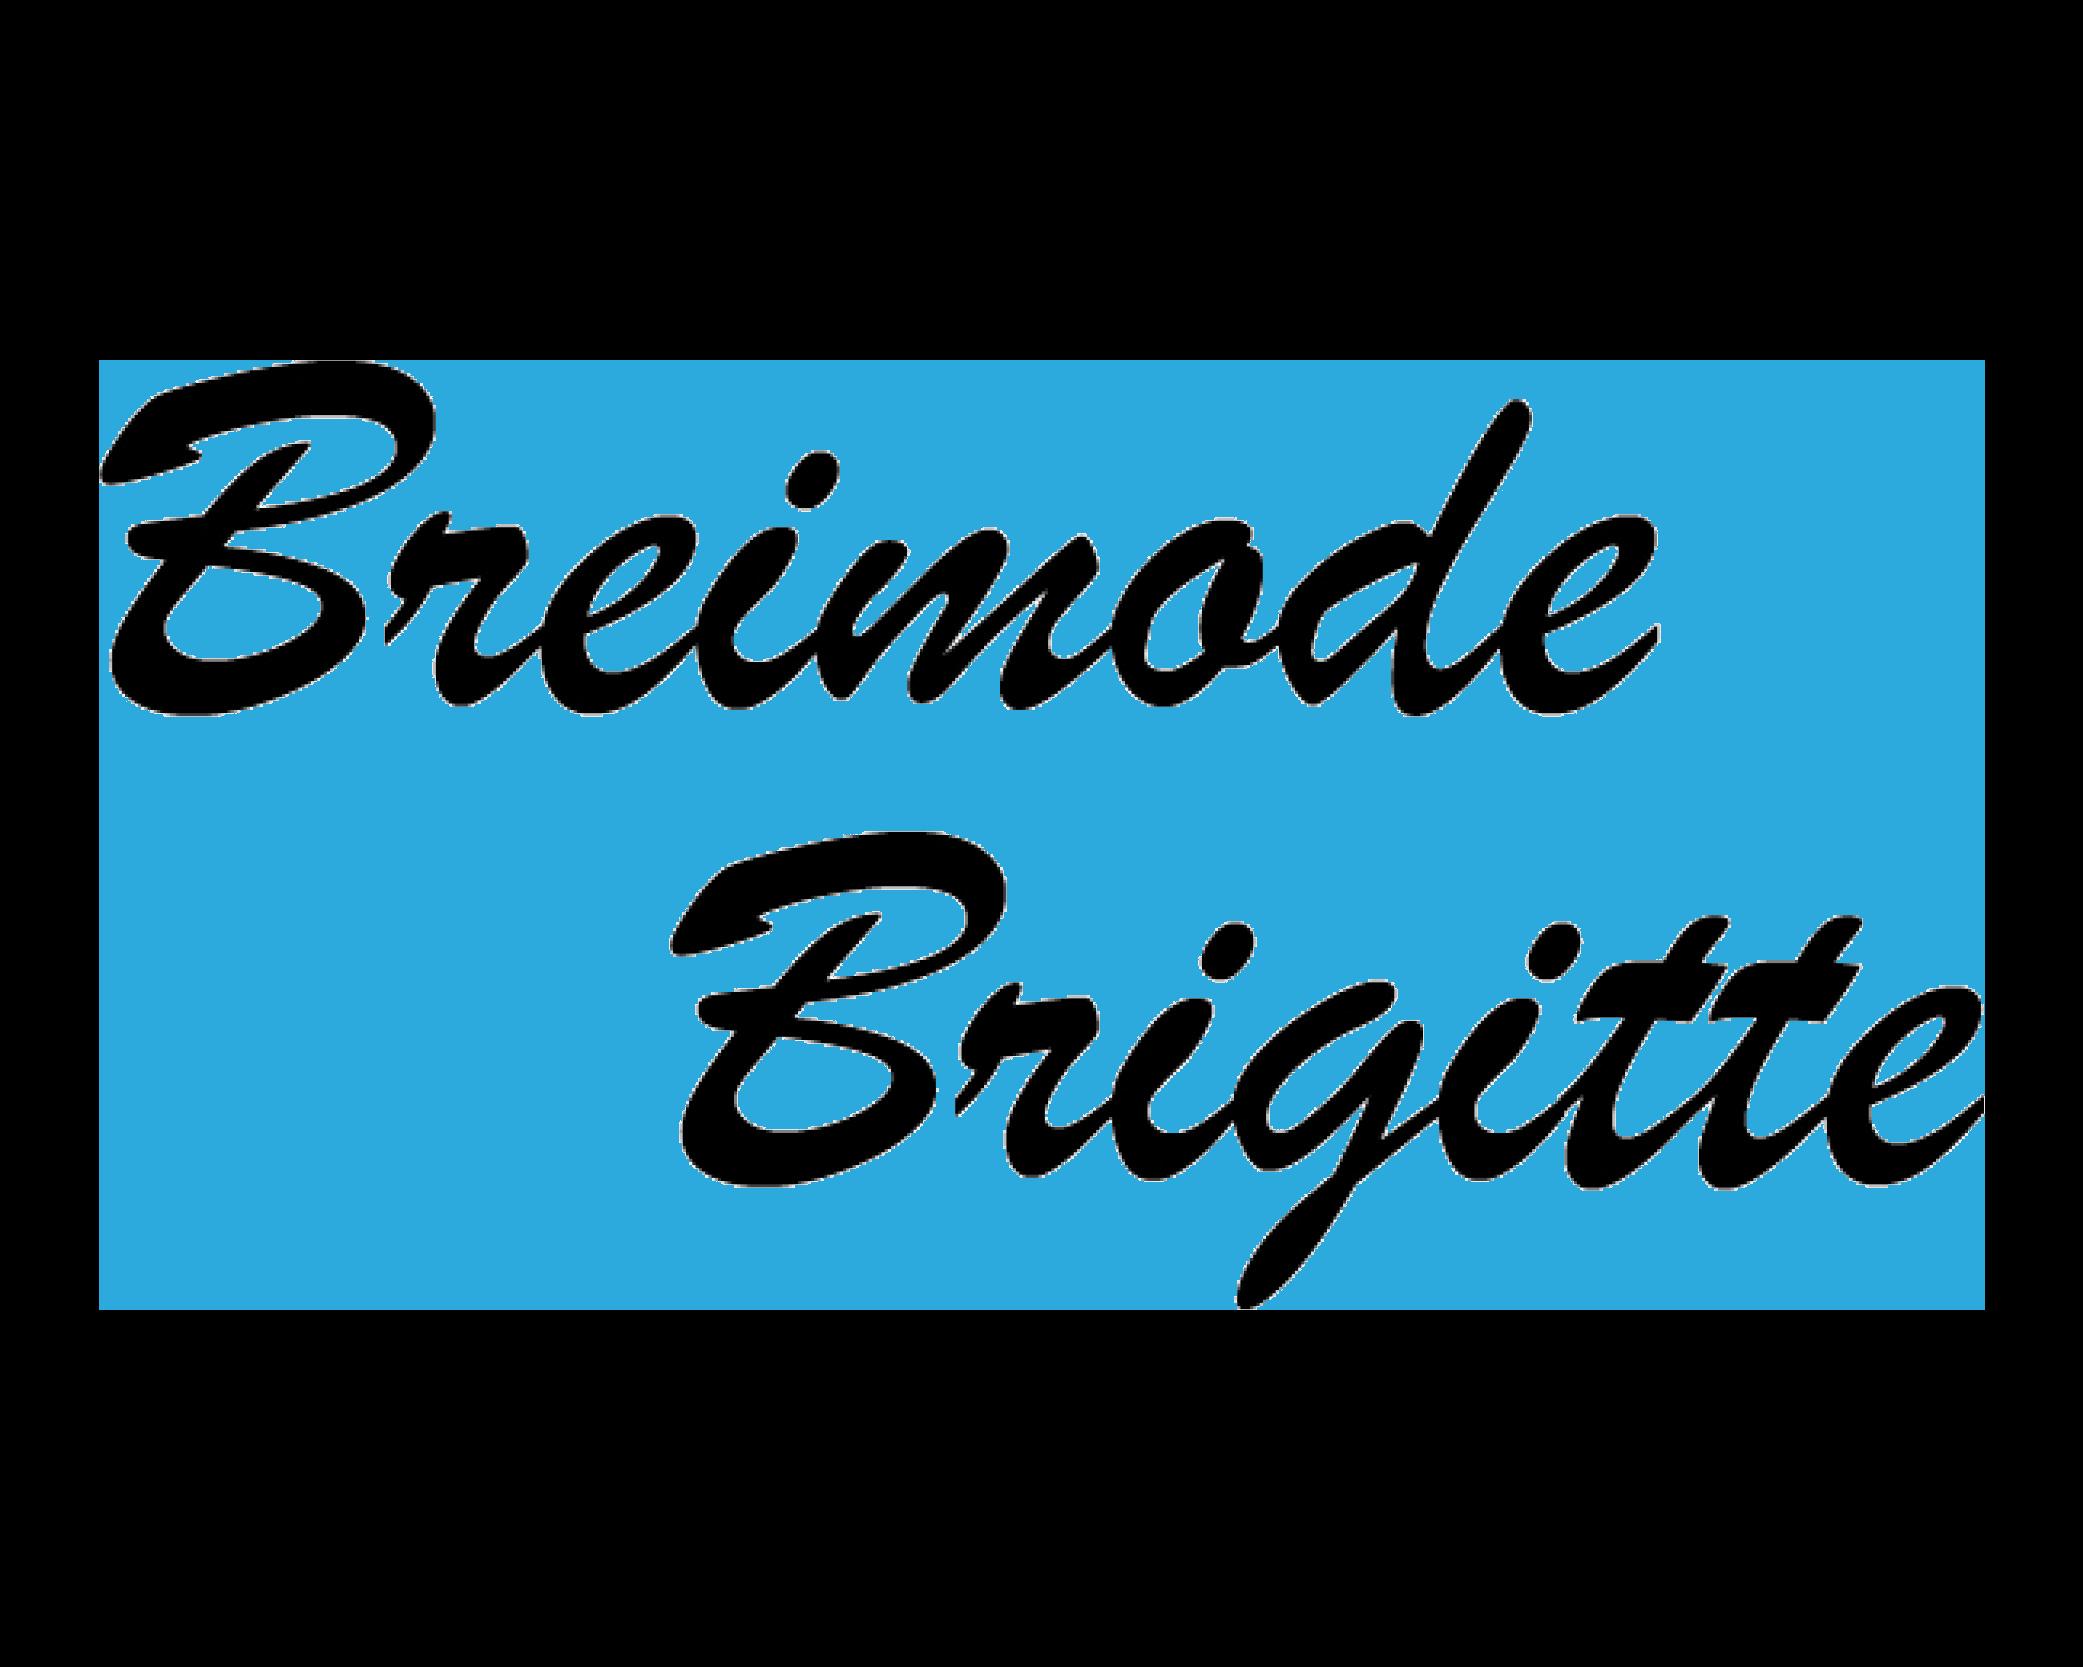 Breimode Brigitte